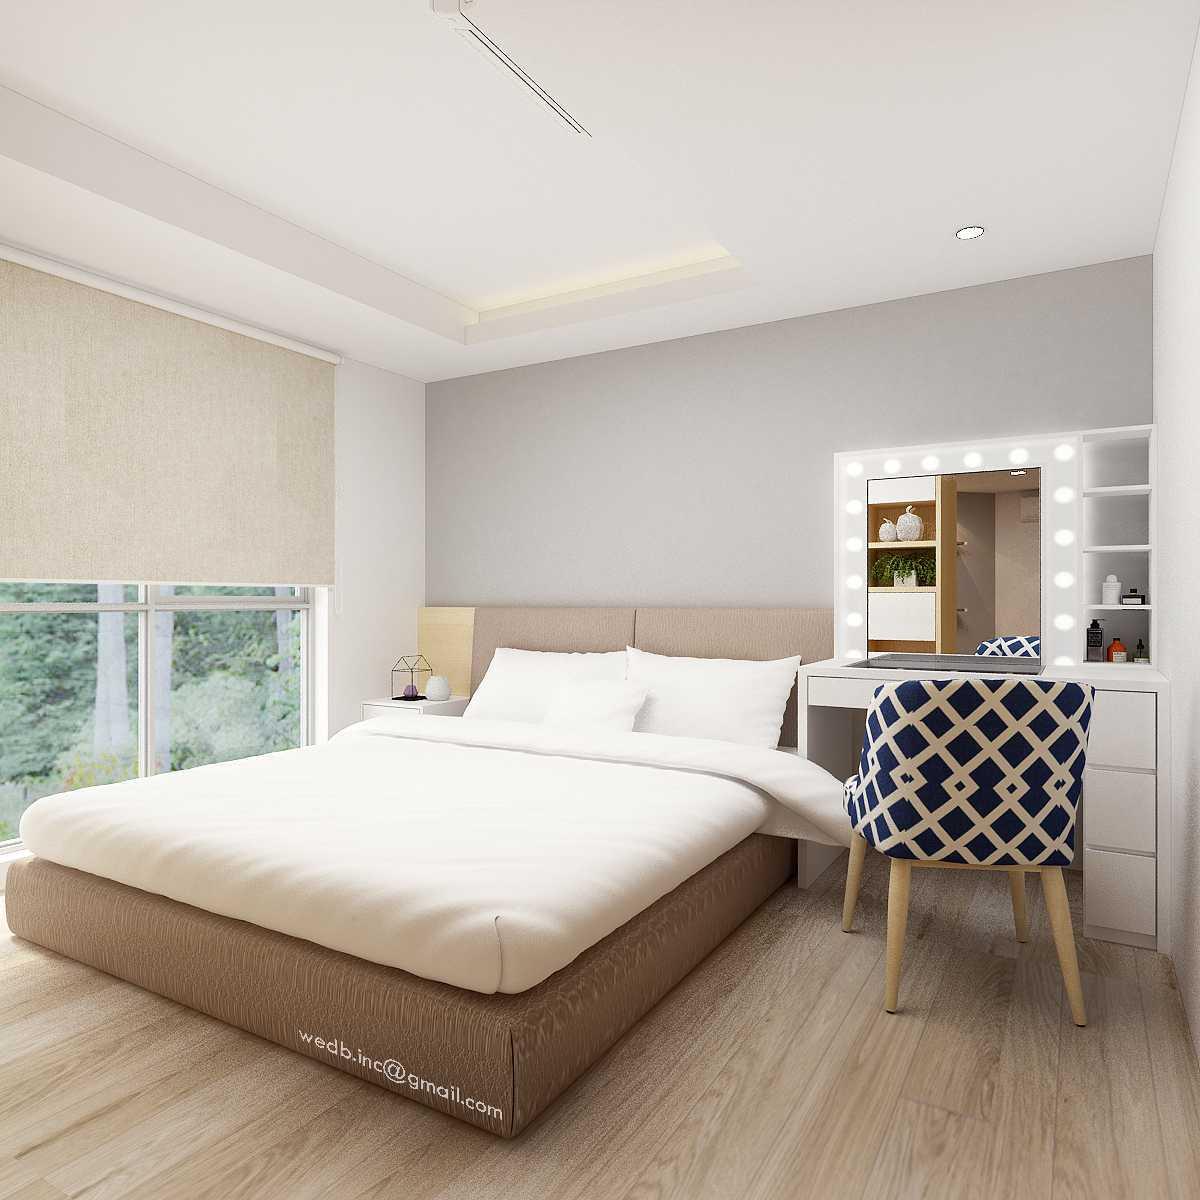 We Design & Build The Mansion | Tower Bougenville Jakarta, Daerah Khusus Ibukota Jakarta, Indonesia Jakarta, Daerah Khusus Ibukota Jakarta, Indonesia We-Design-Build-Springhill-Residence-Tower-Bougenville   62562